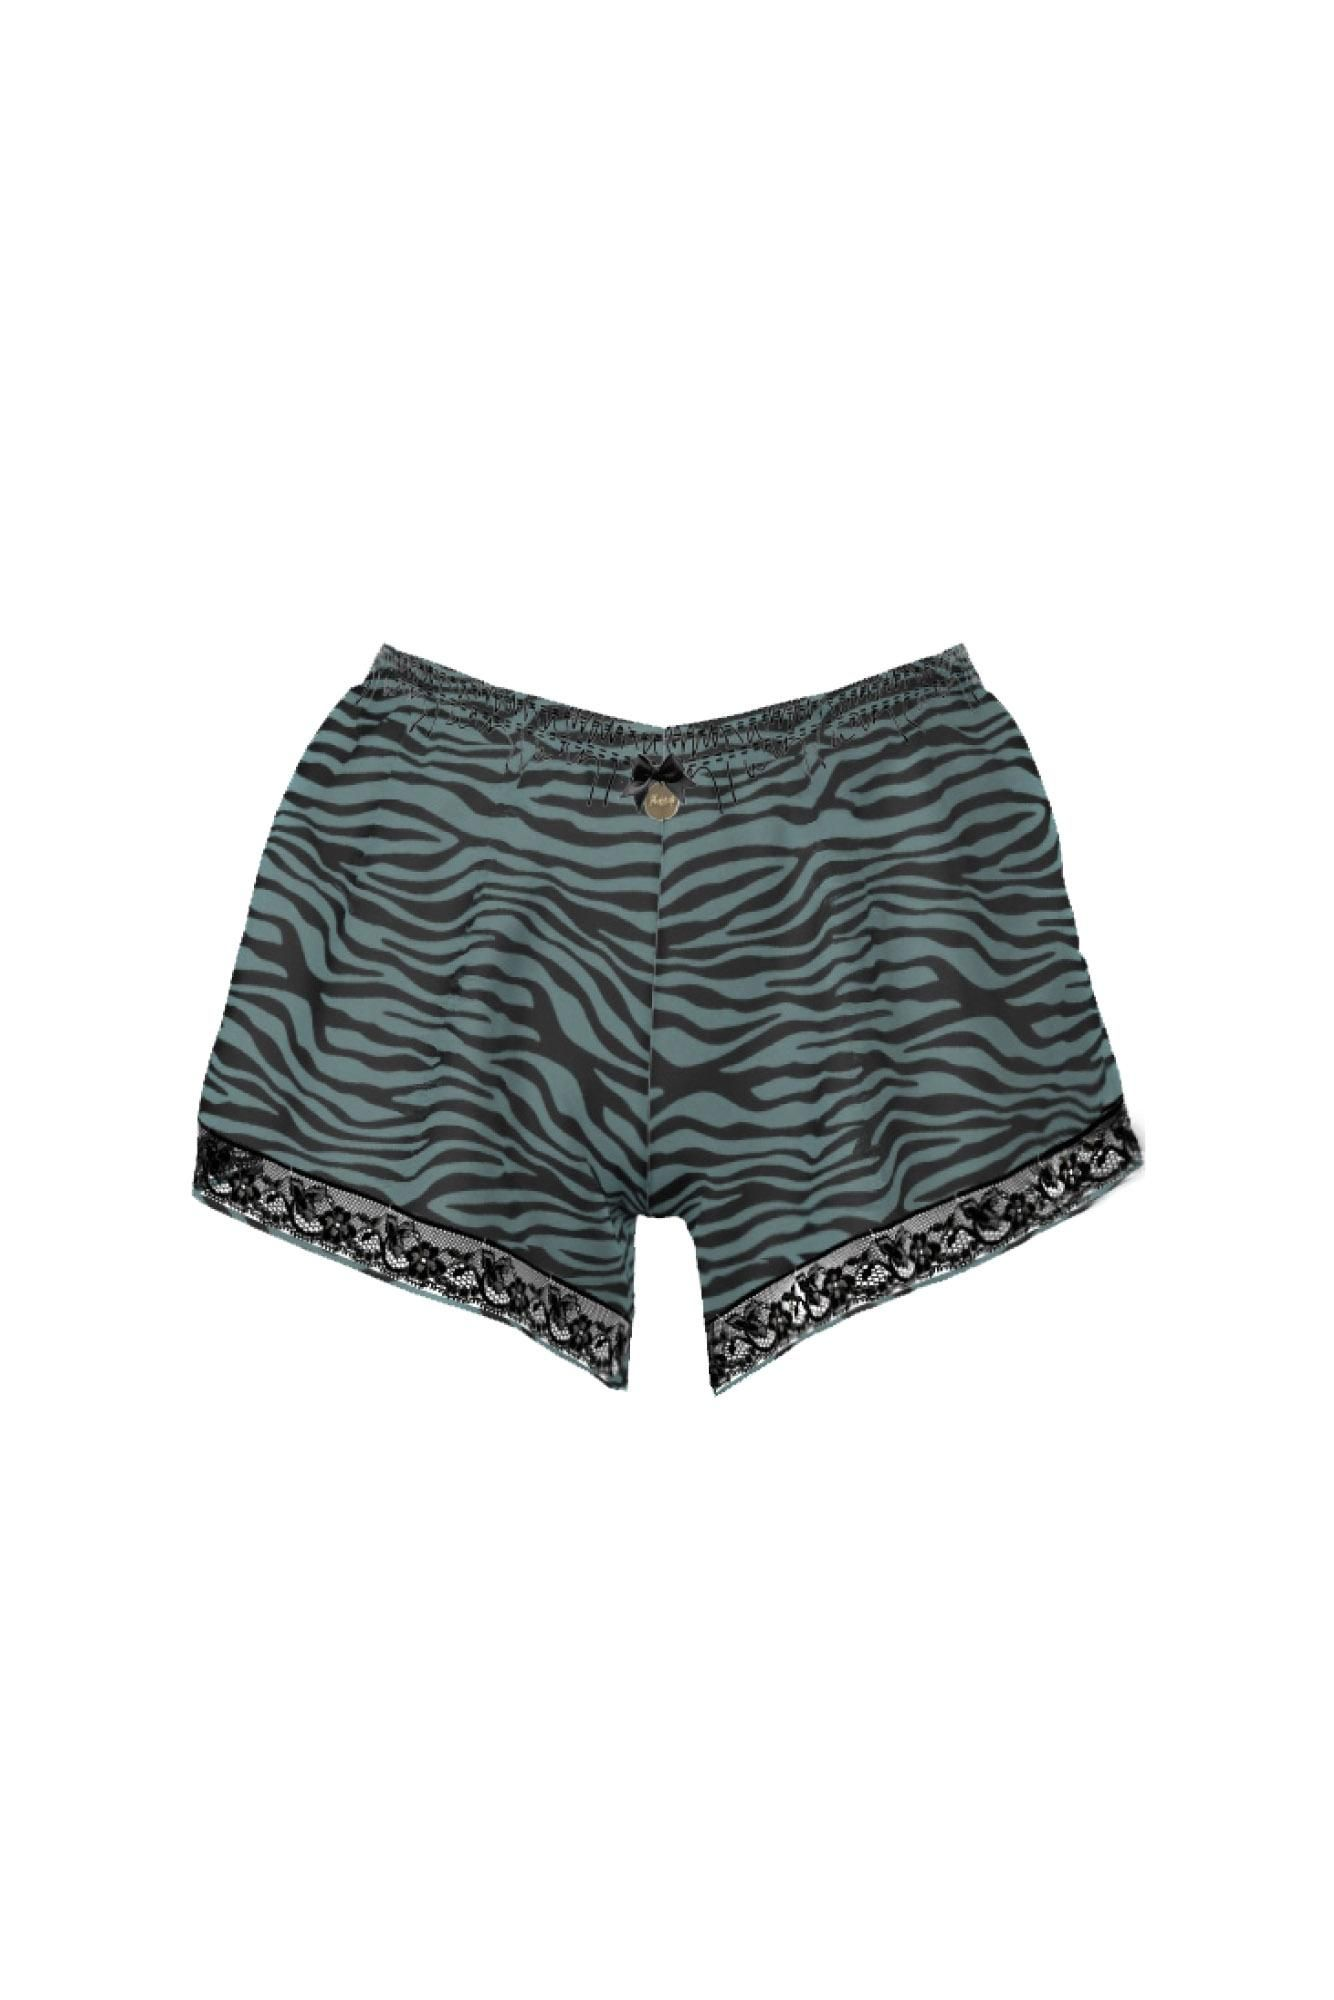 Women's Animal Print Shorts